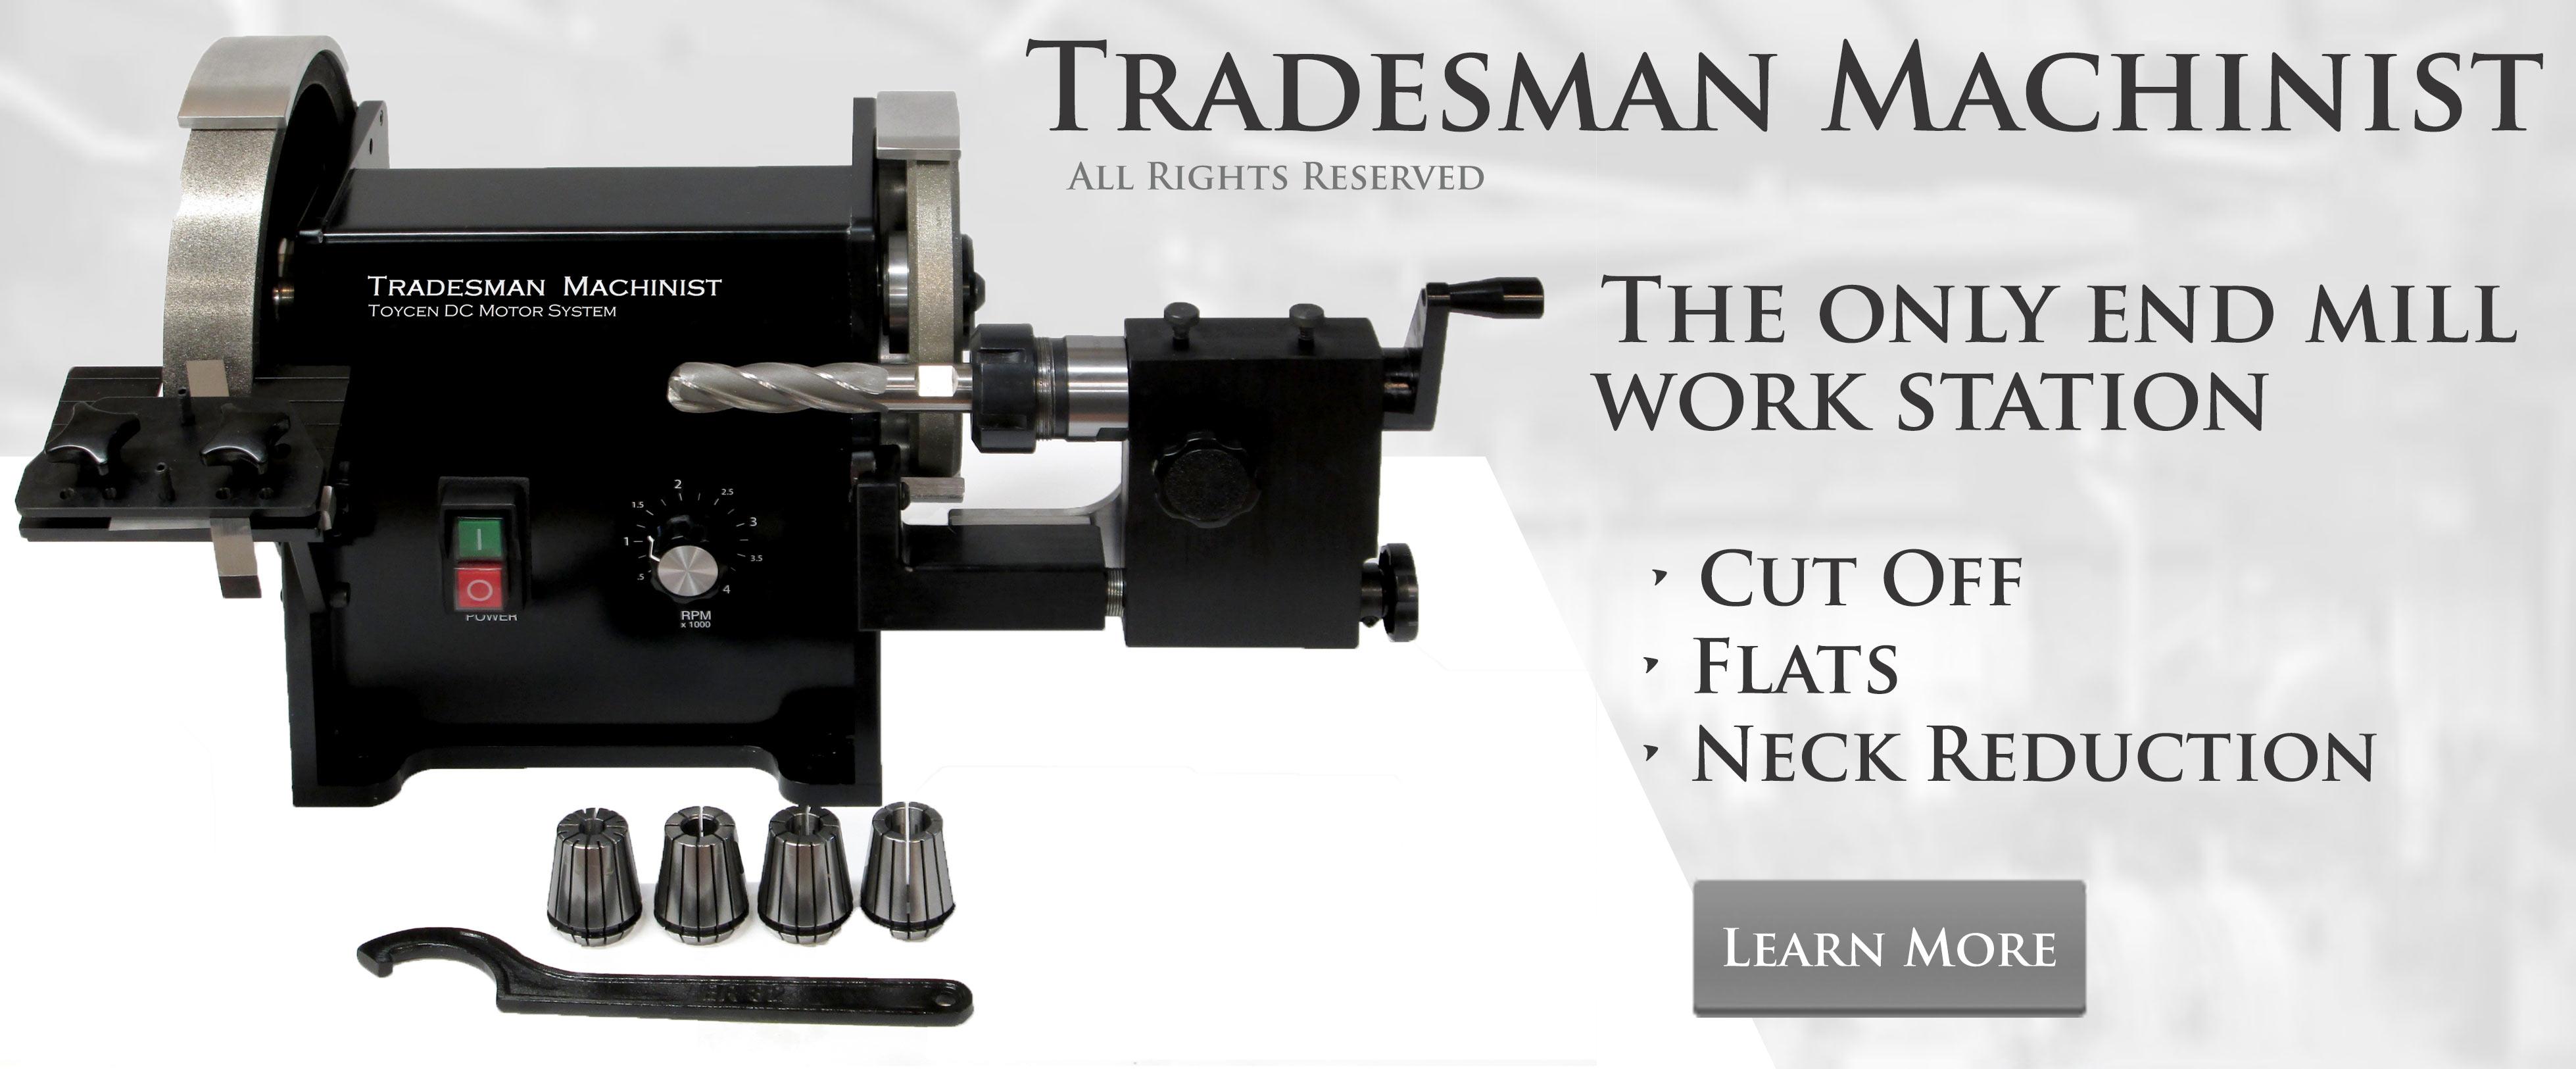 Tradesman-Machinist-2